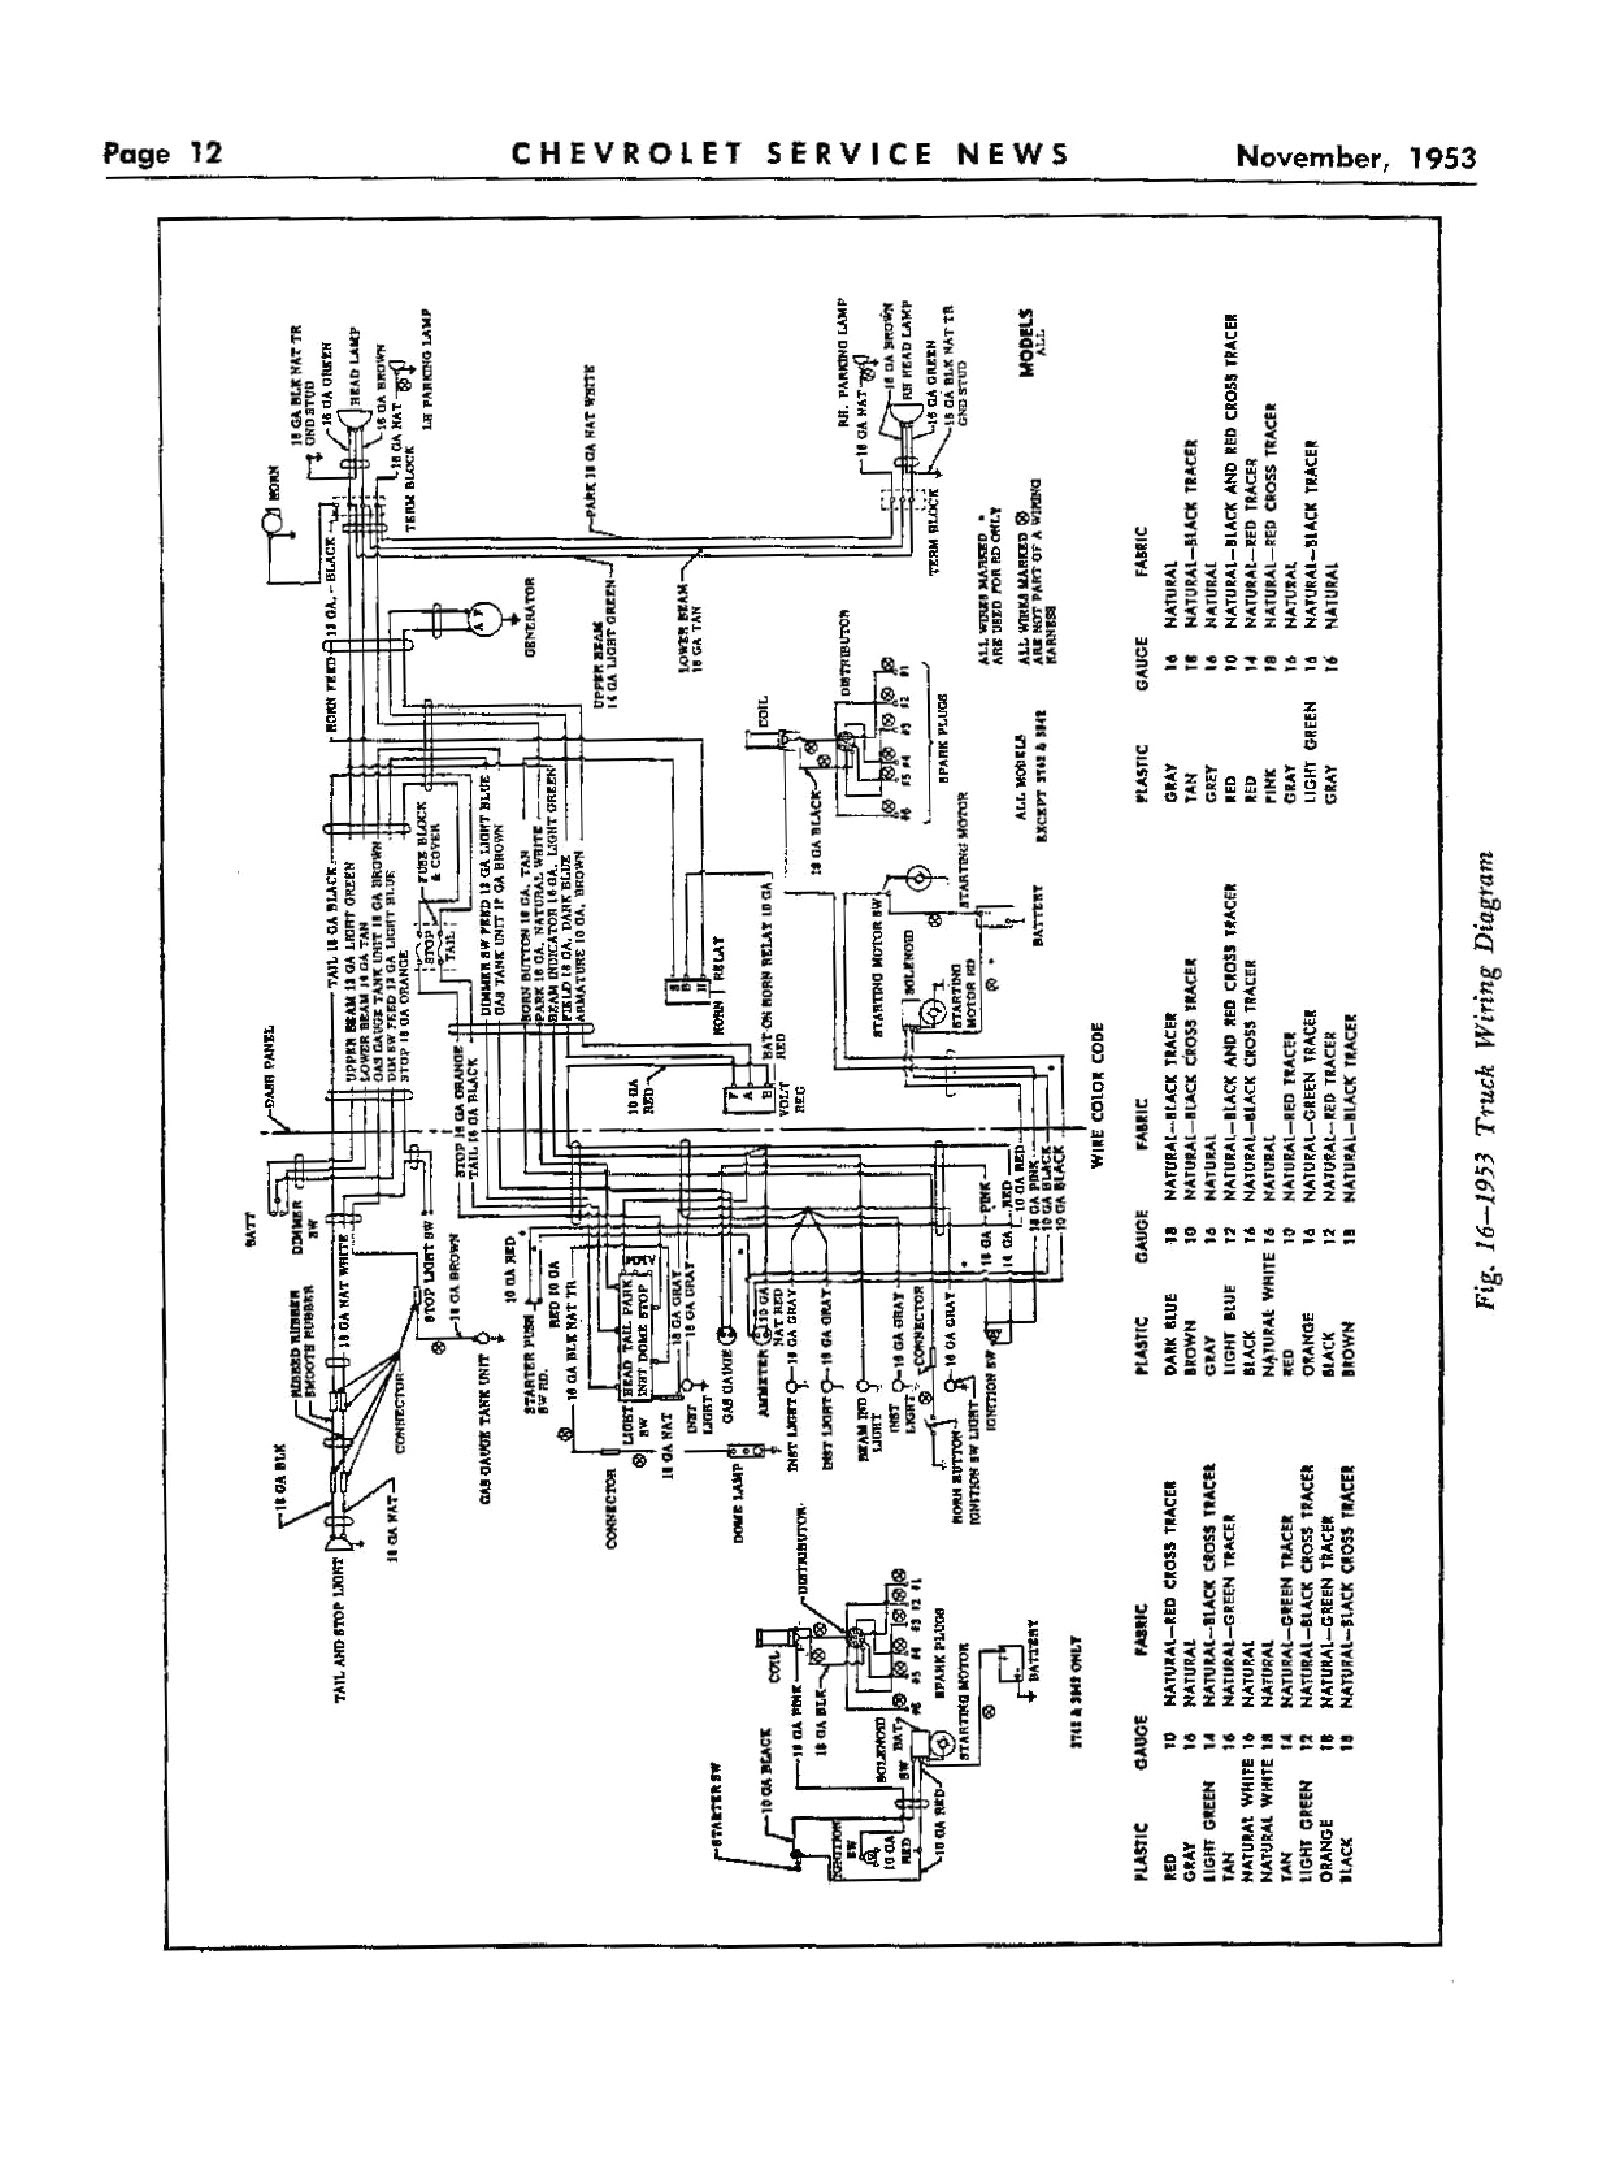 1950 Ford Car Wire Harnes Diagram